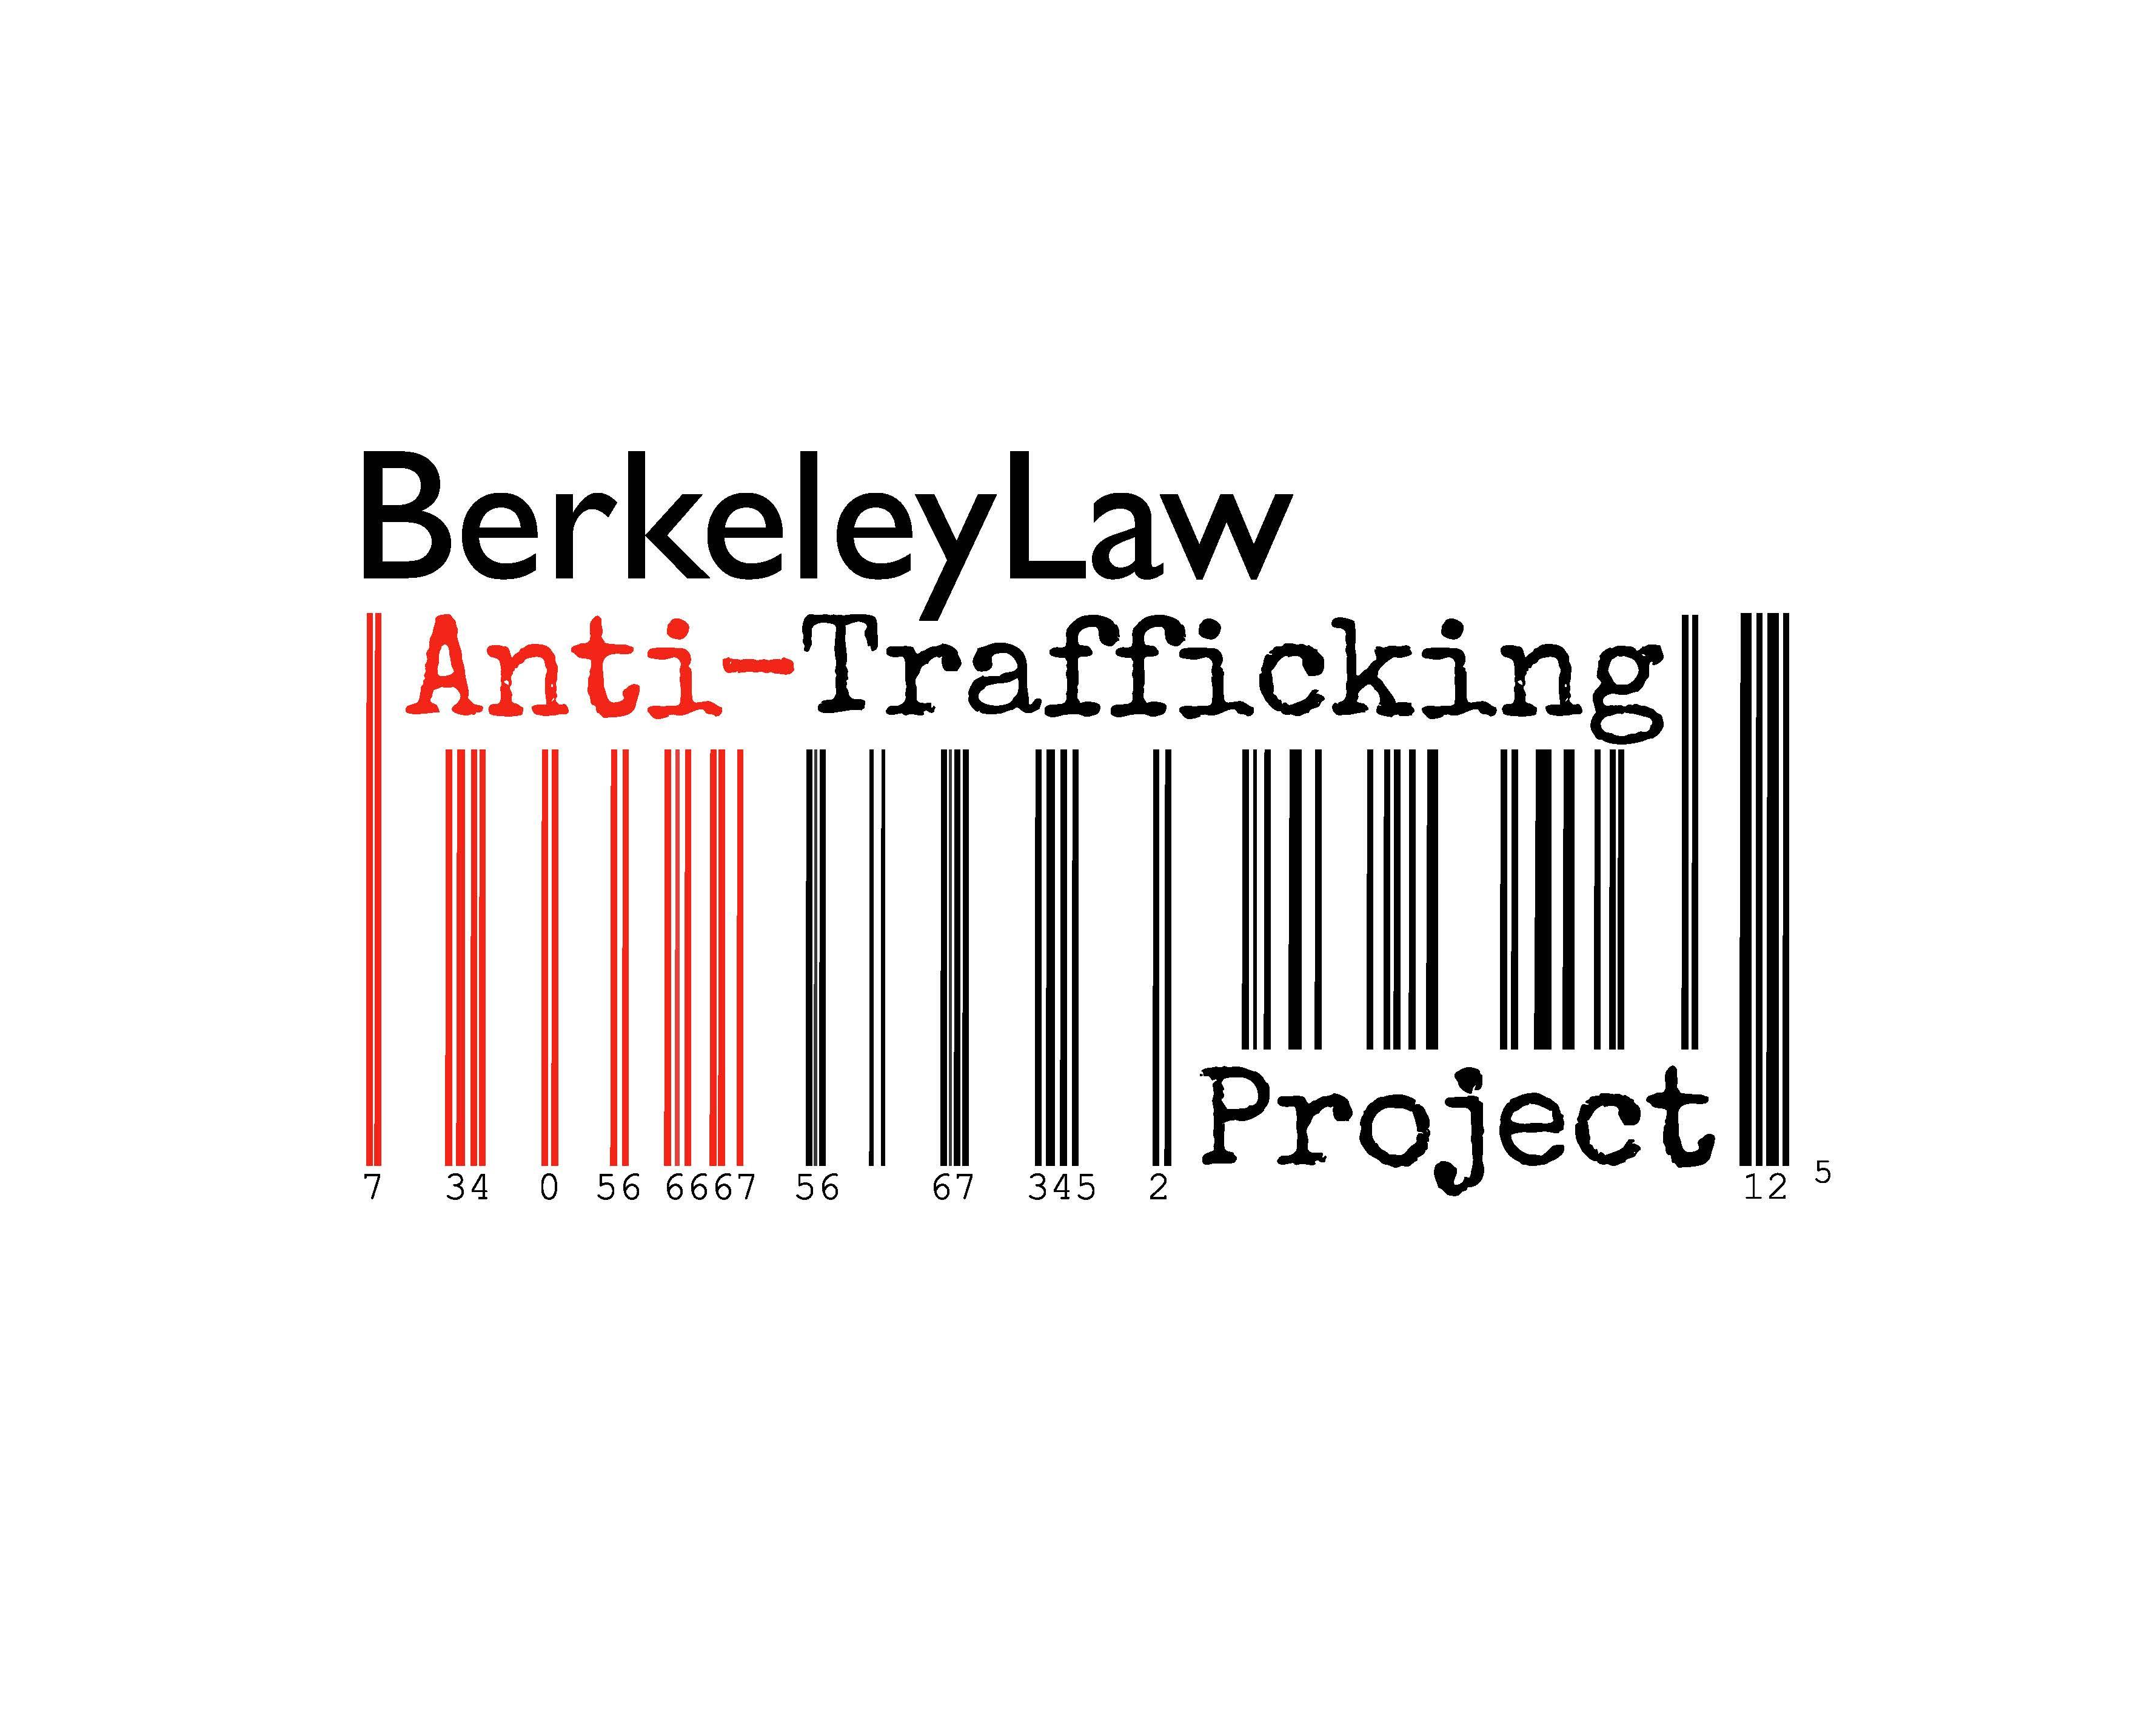 Berkeley Law Antitrafficking Project | Berkeley Law pertaining to Berkeley Academic Calender